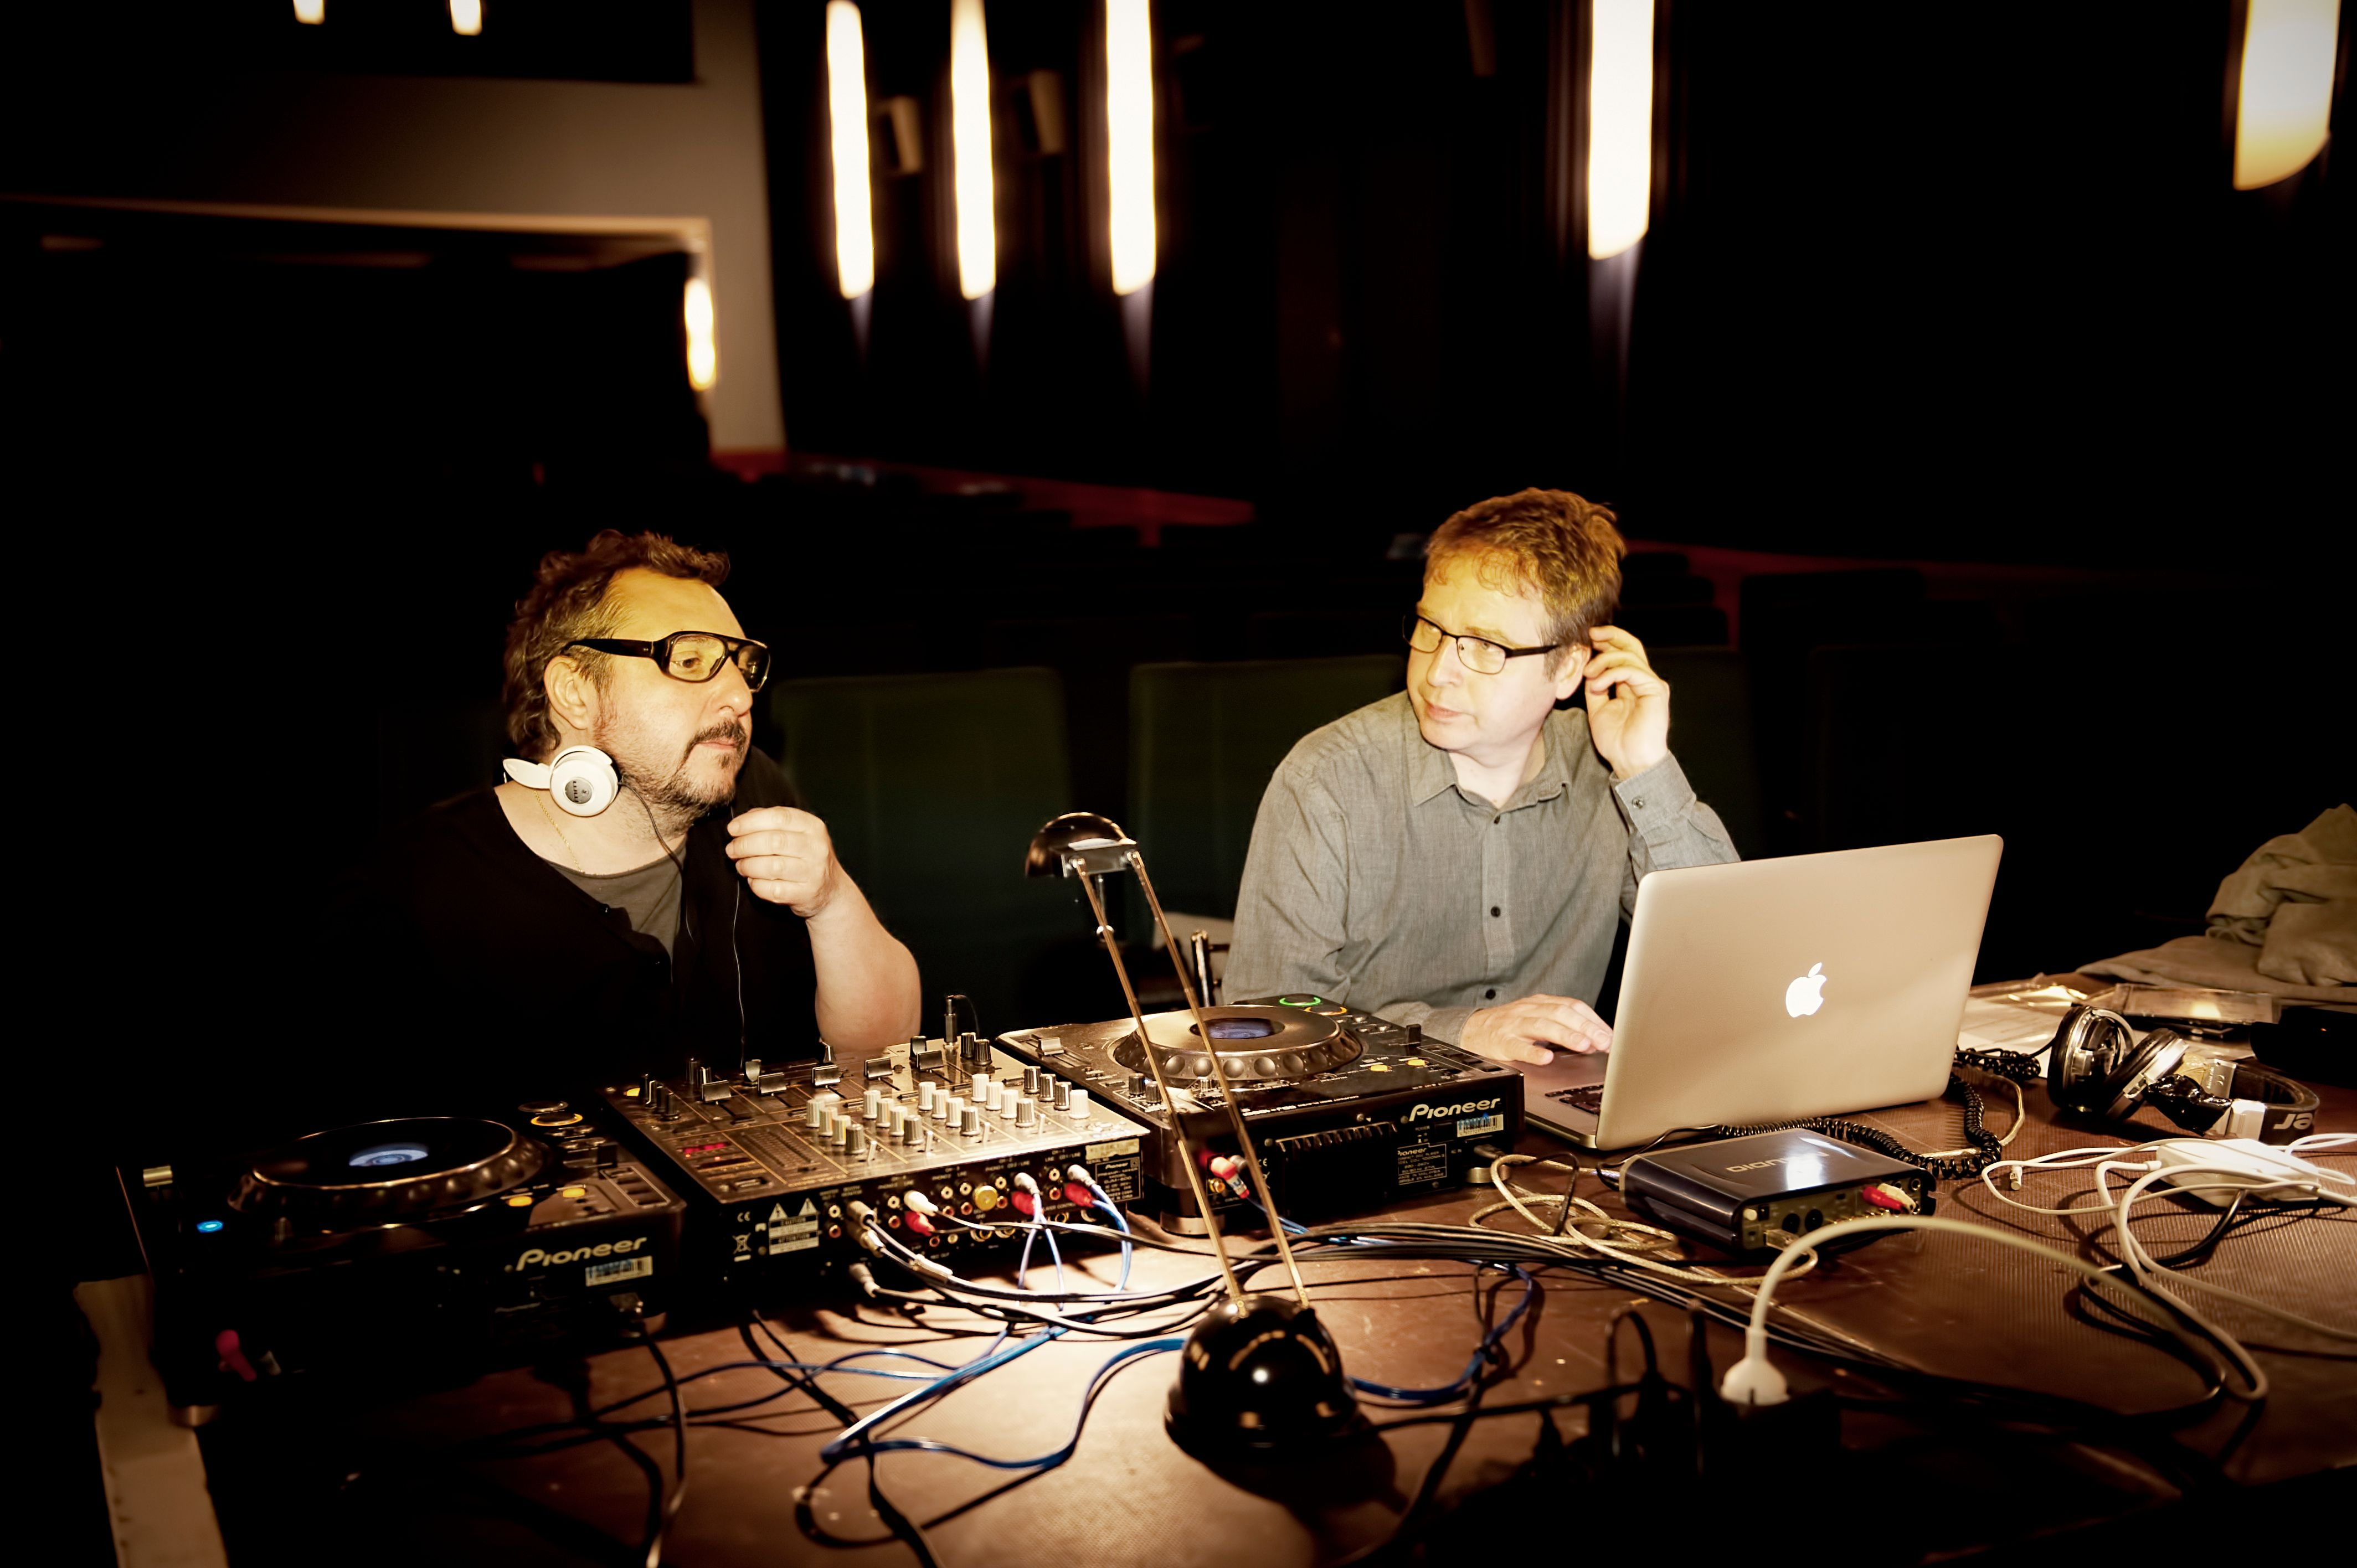 the DJ duo of Radiomentale